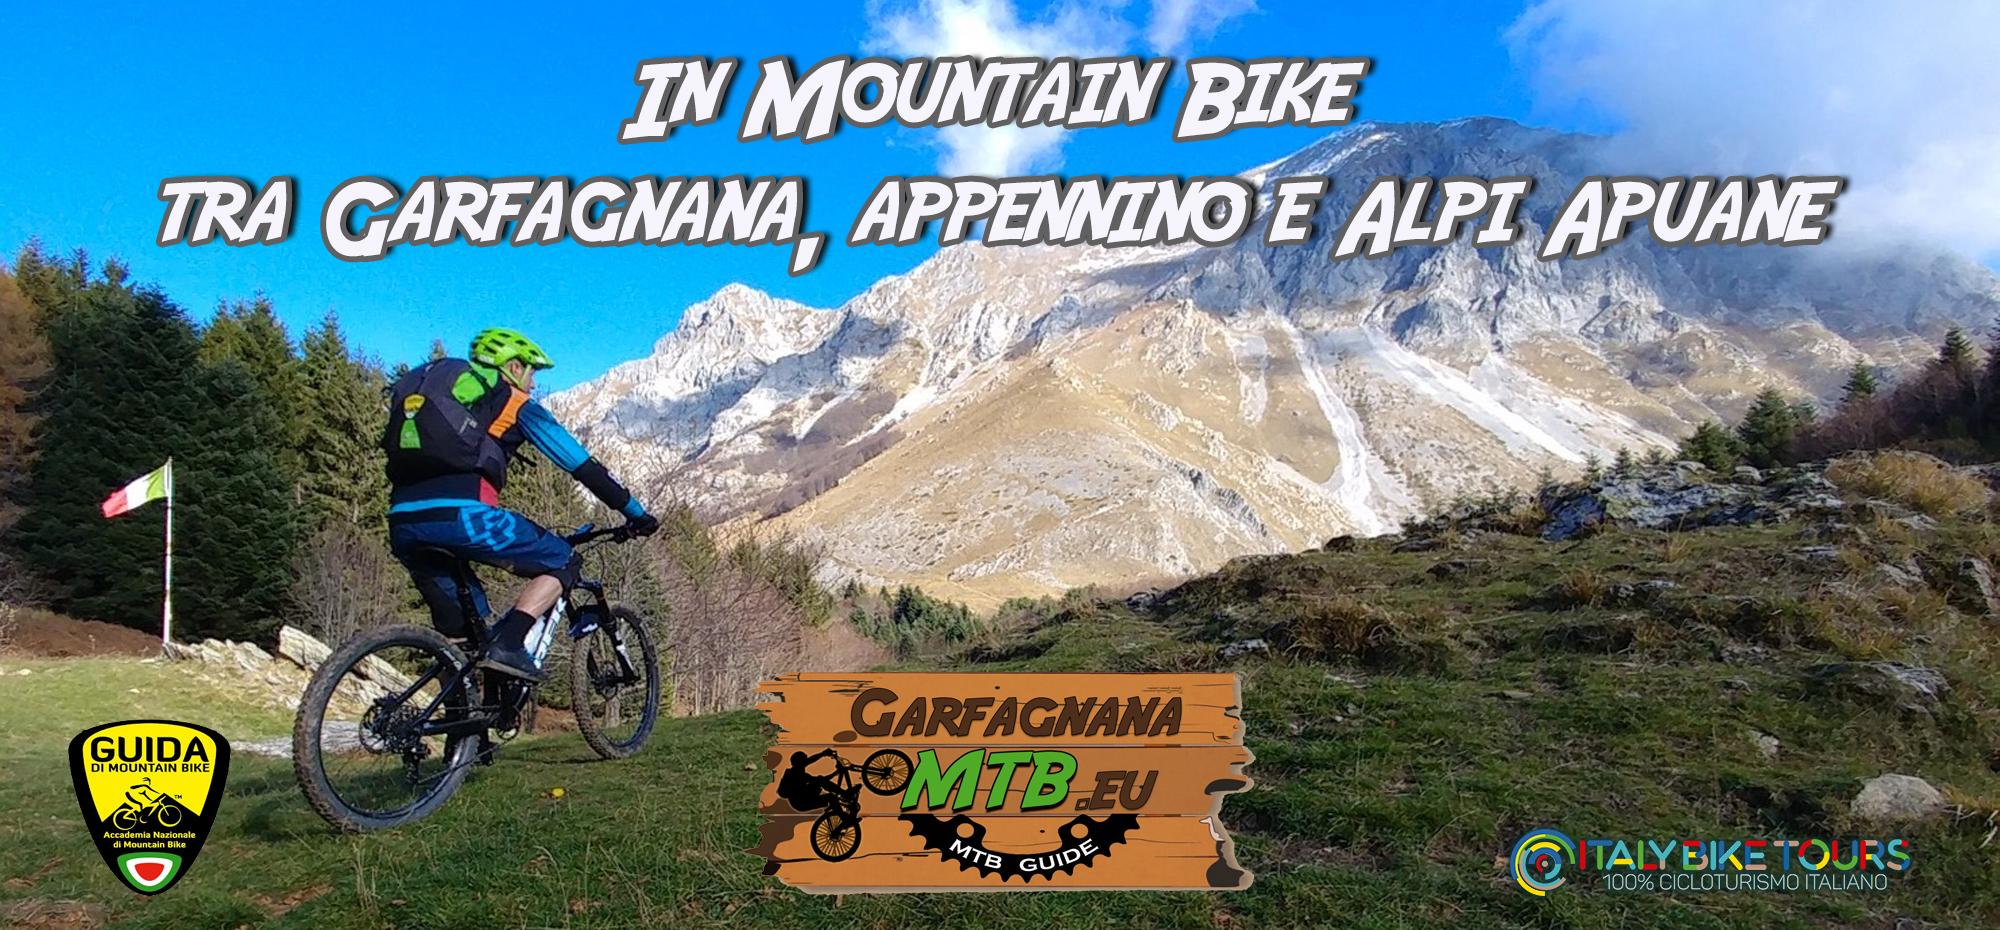 Garfagnana MTB